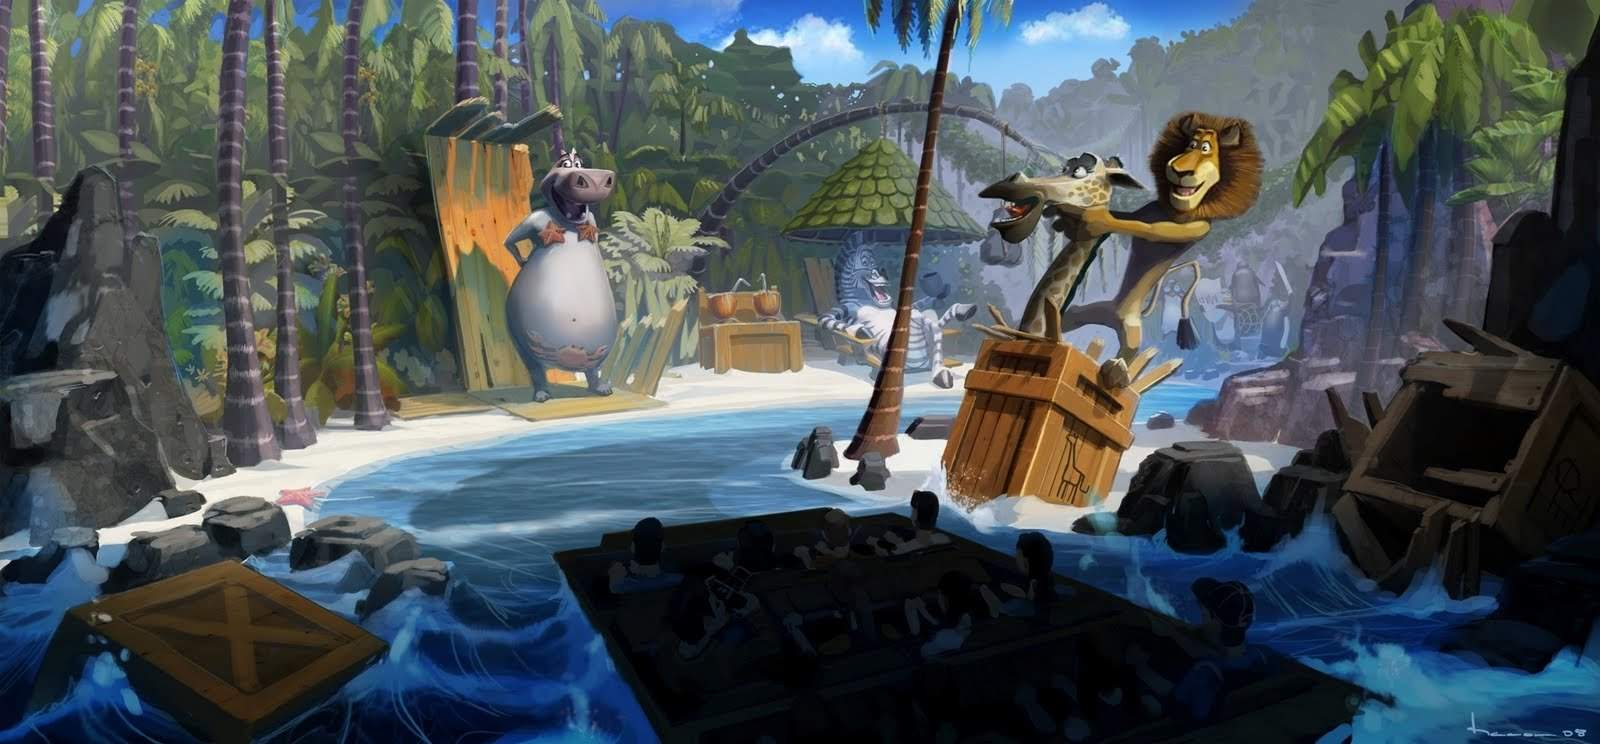 3 ways universal orlando can use dreamworks madagascar a crate adventure universal studios singapore ccuart Gallery